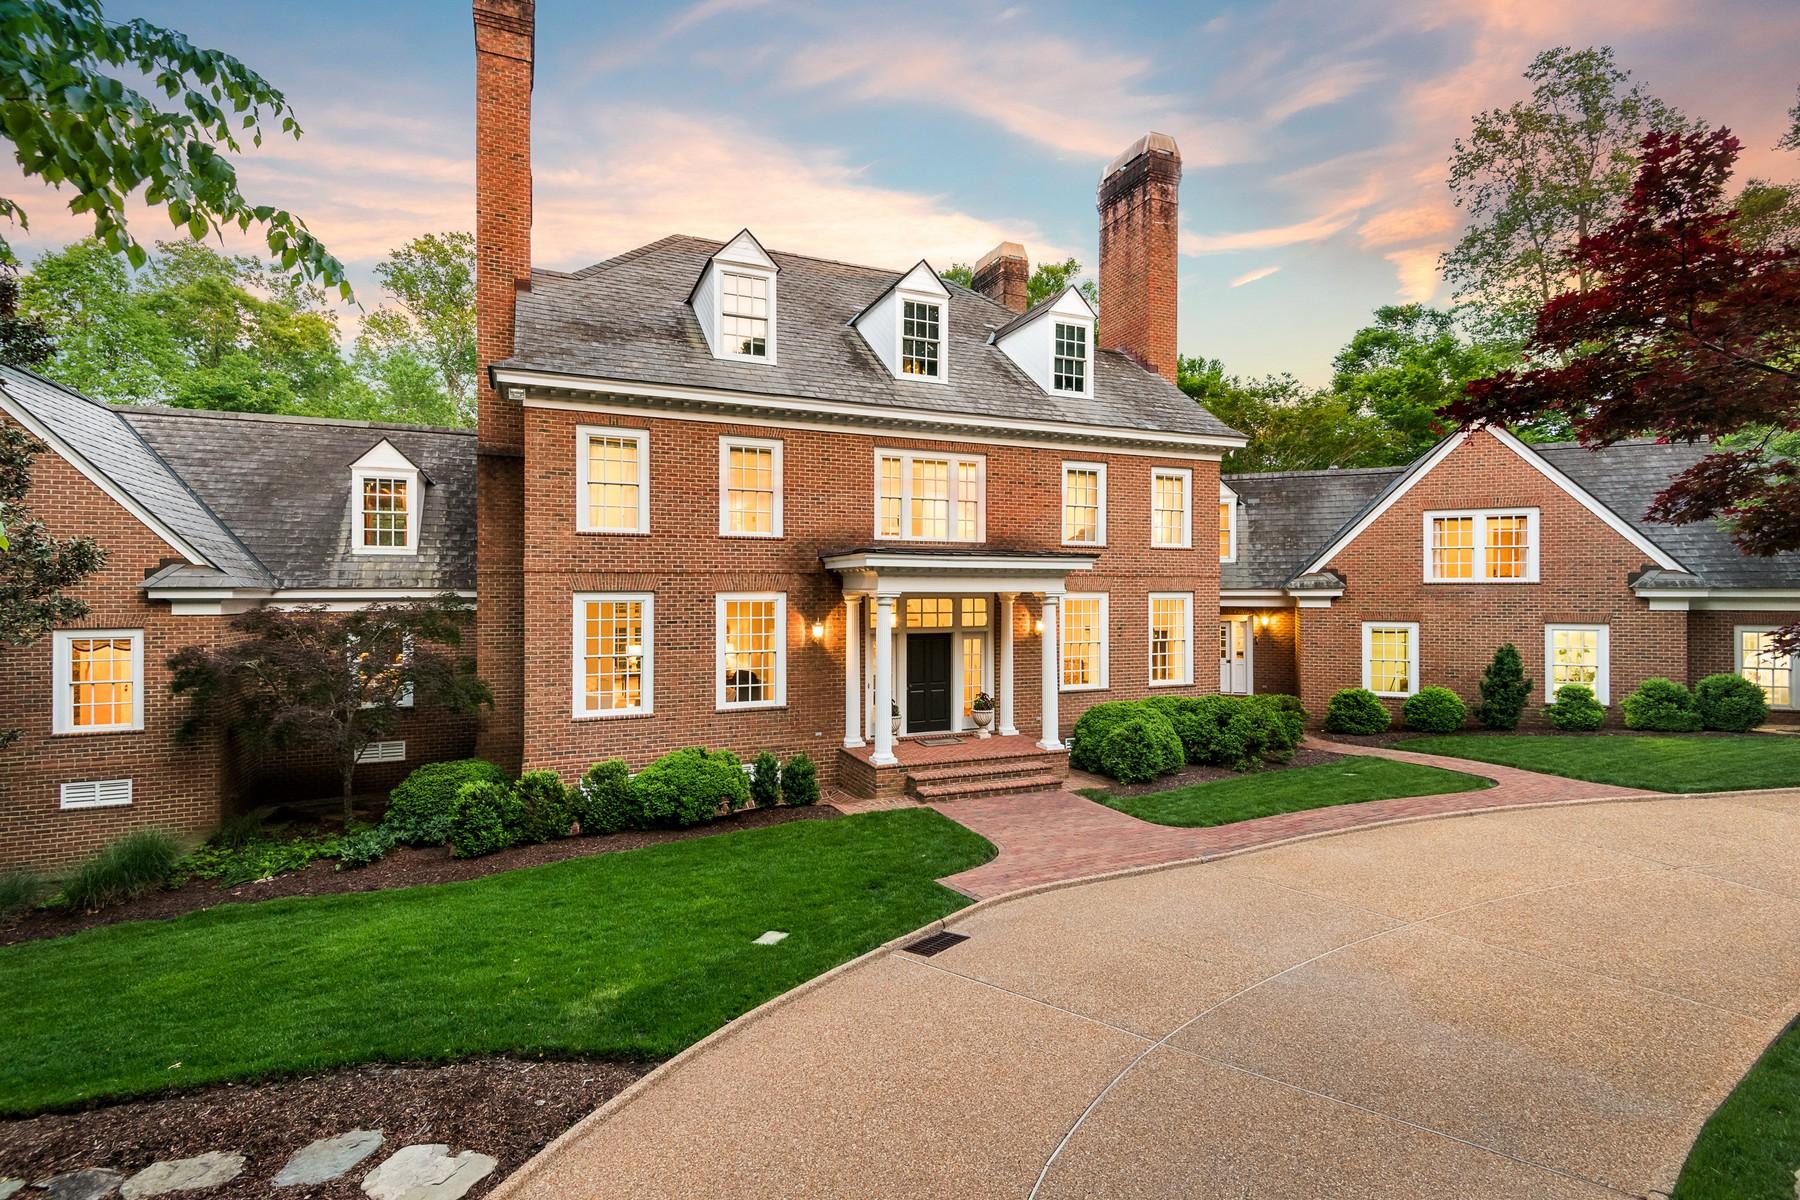 Single Family Homes por un Venta en 800 South England Circle, Williamsburg 800 South England Circle Williamsburg, Virginia 23185 Estados Unidos